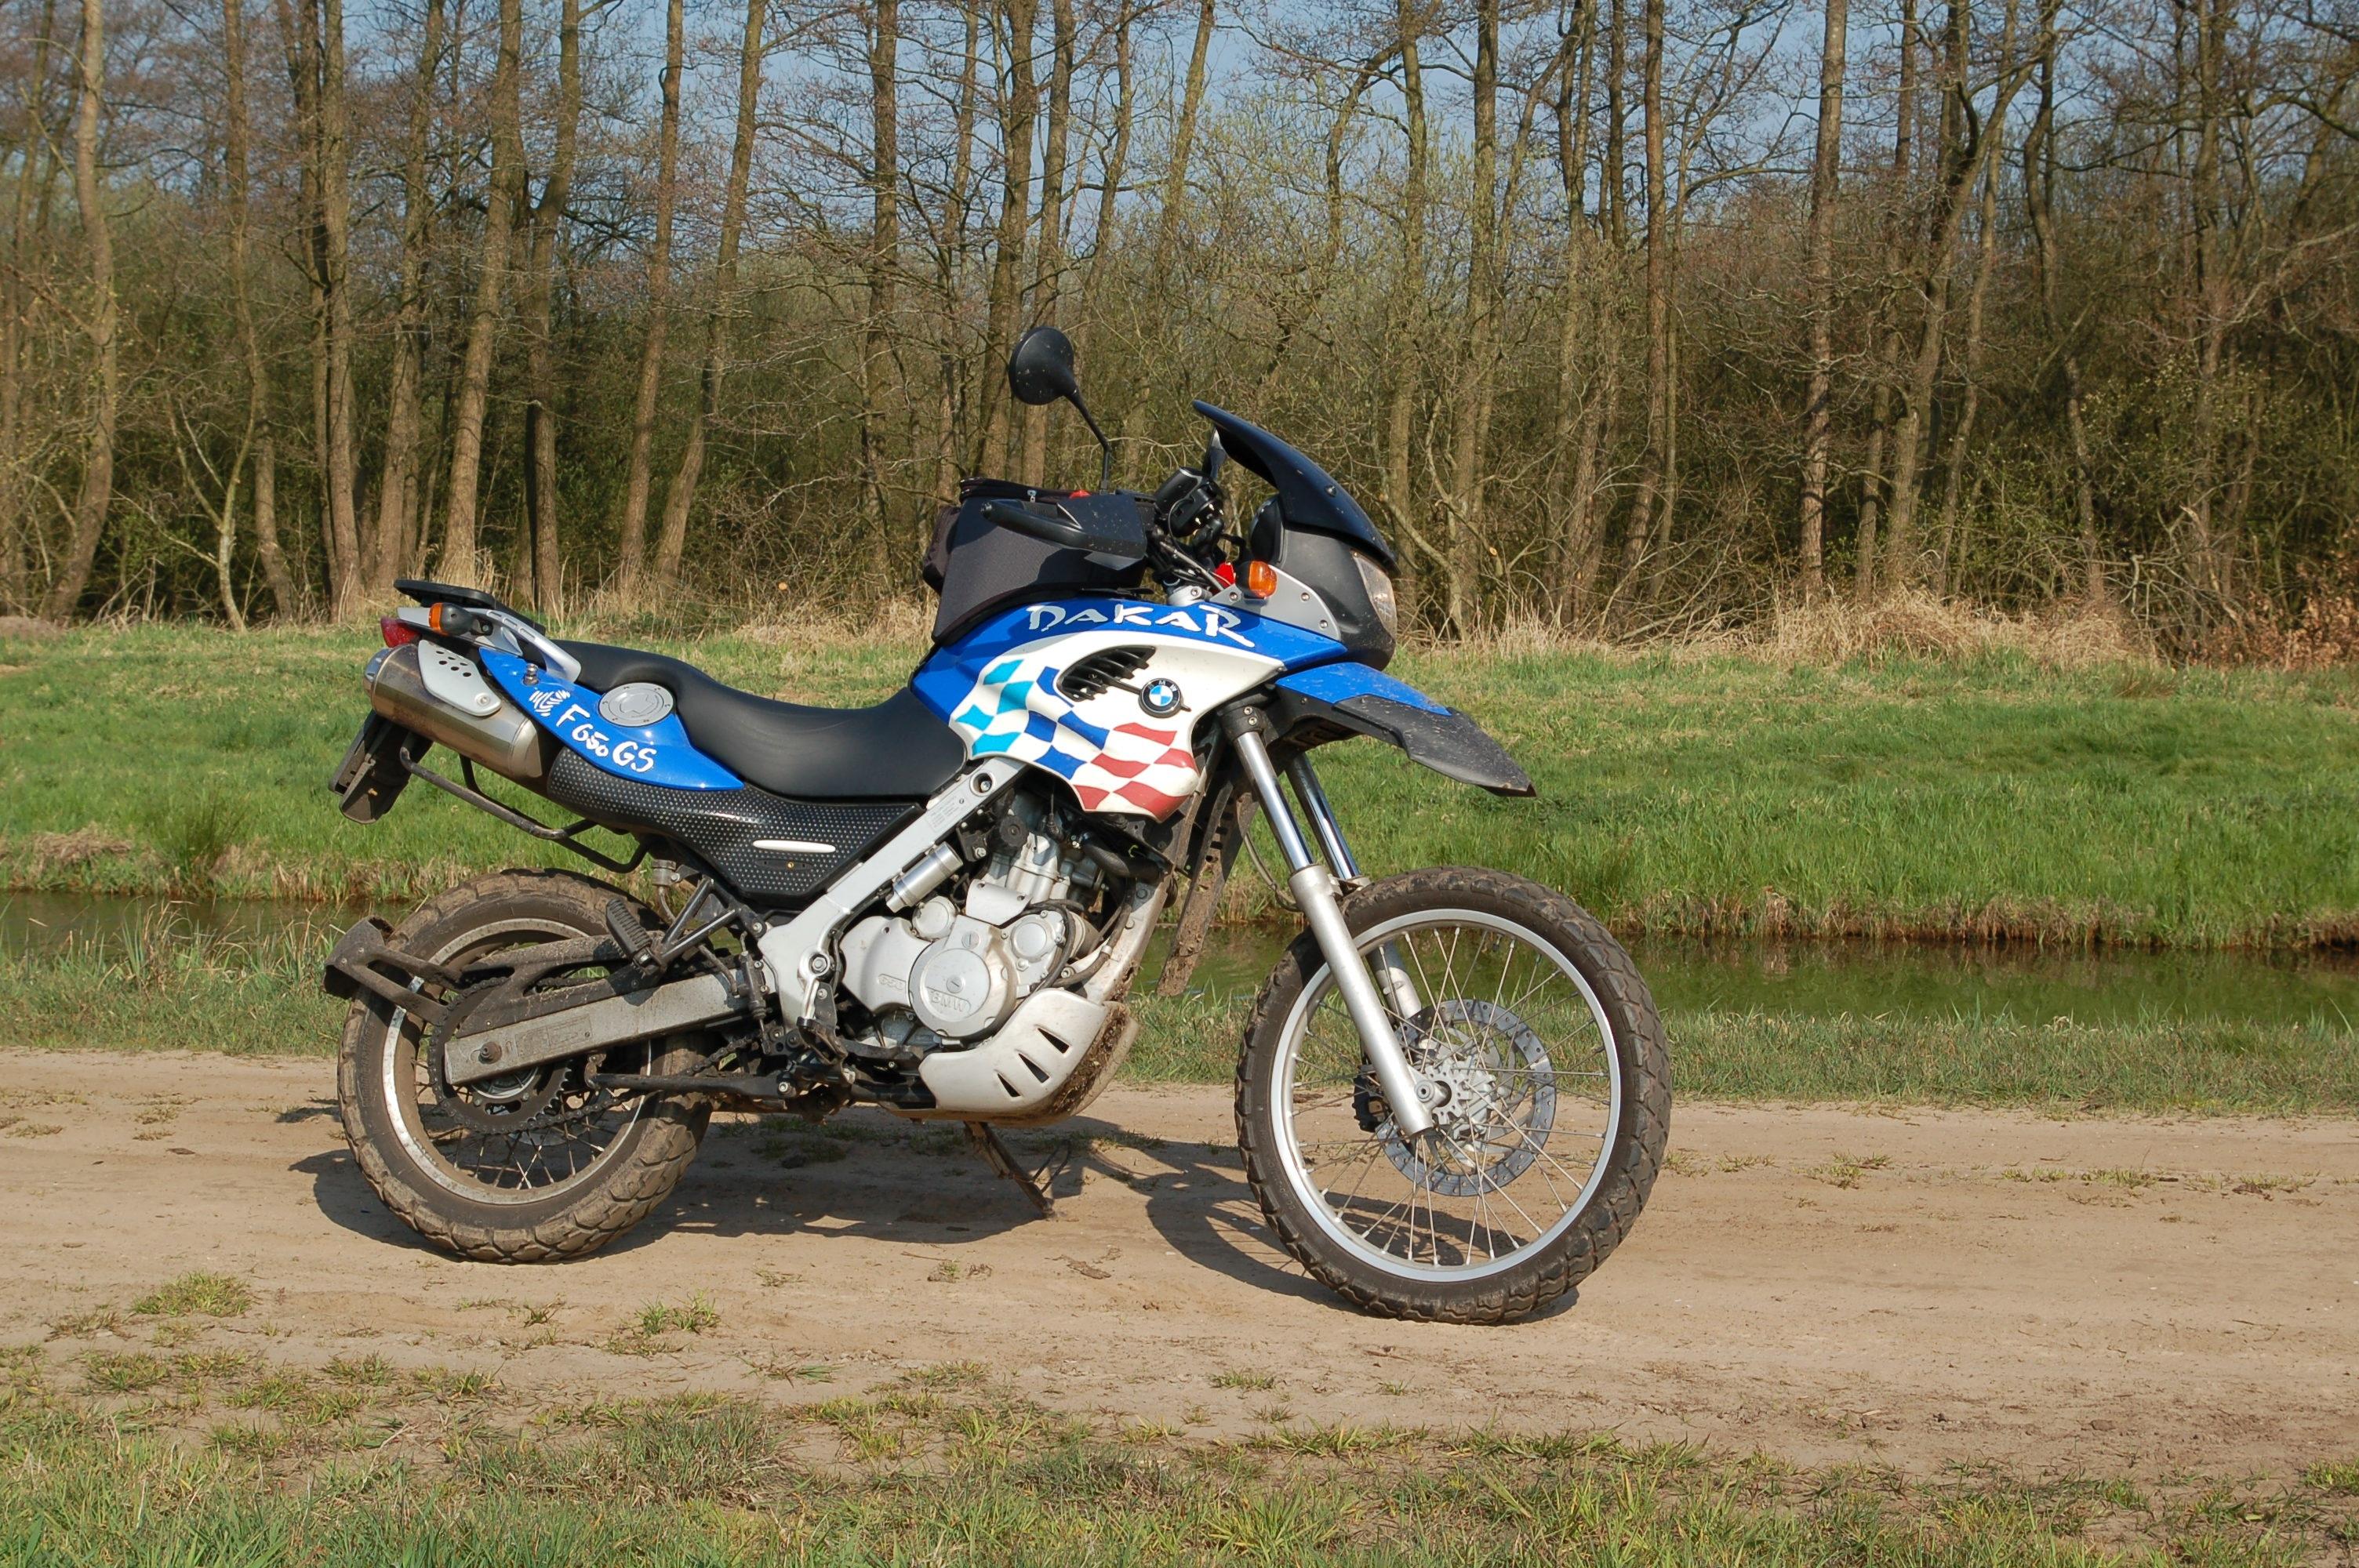 Fotoğraf Araba Bisiklet Araç Motosiklet Motokros Toprak Mavi